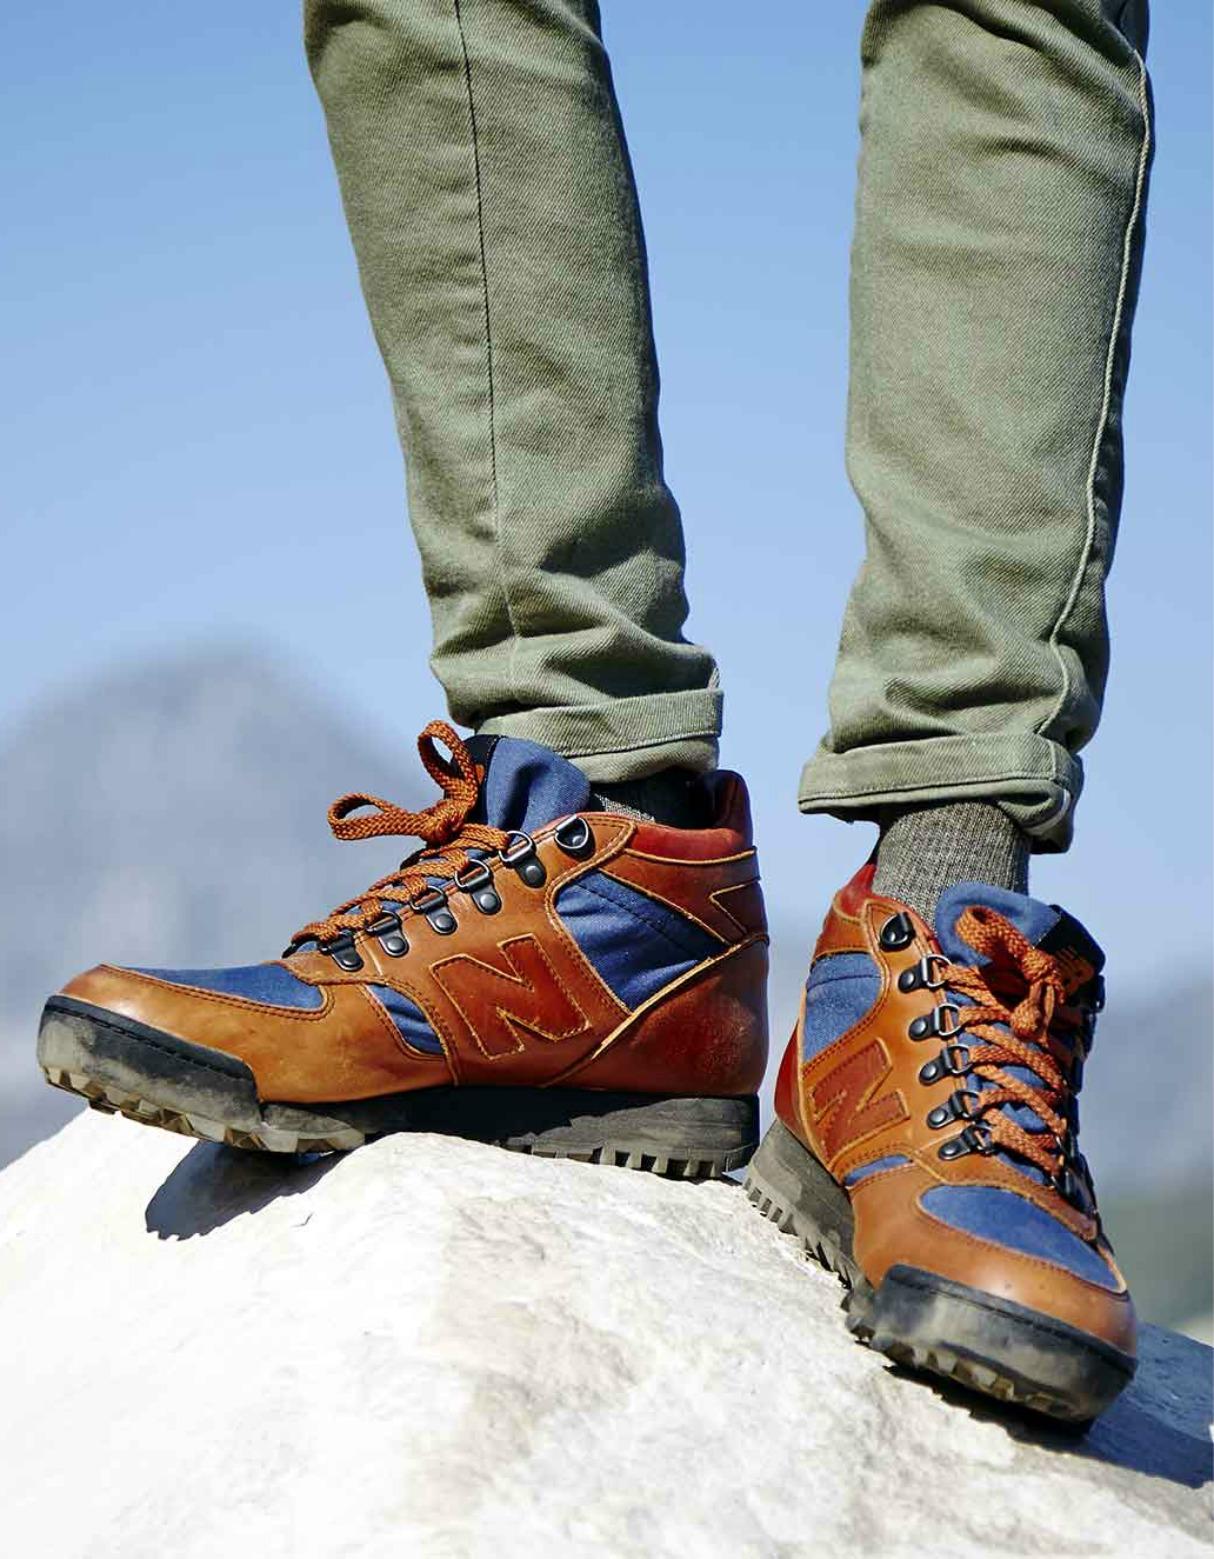 New Balance Rainier Remastered Hiking Boots 4